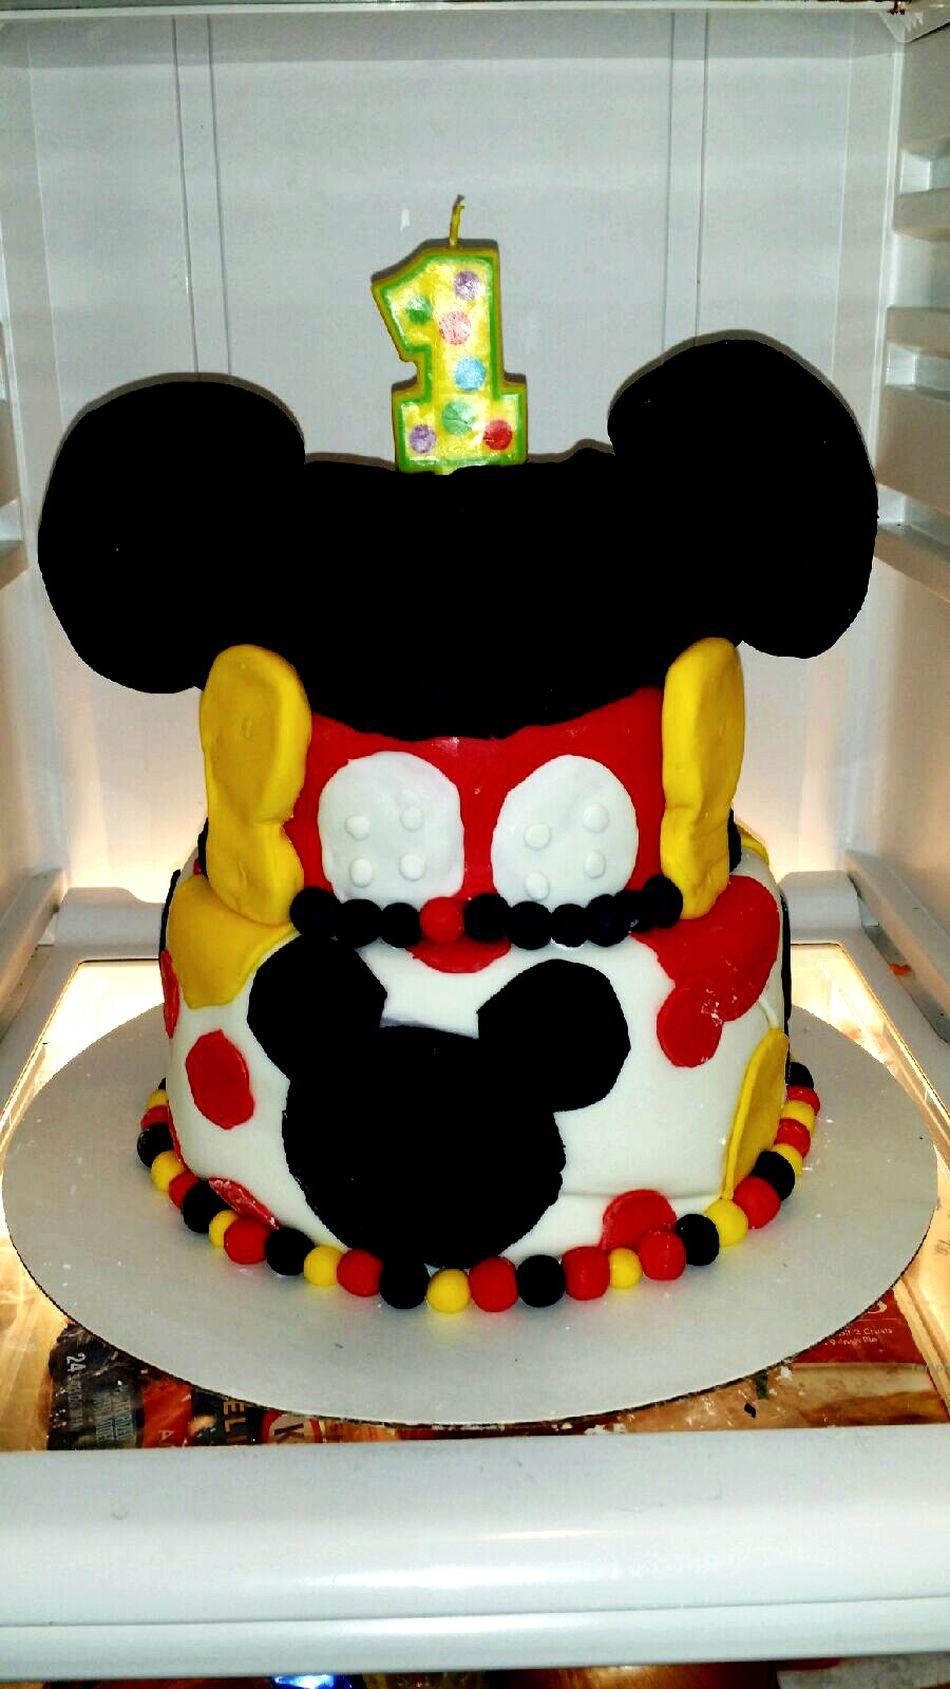 Pooders Bday Cake First Eyeem Photo